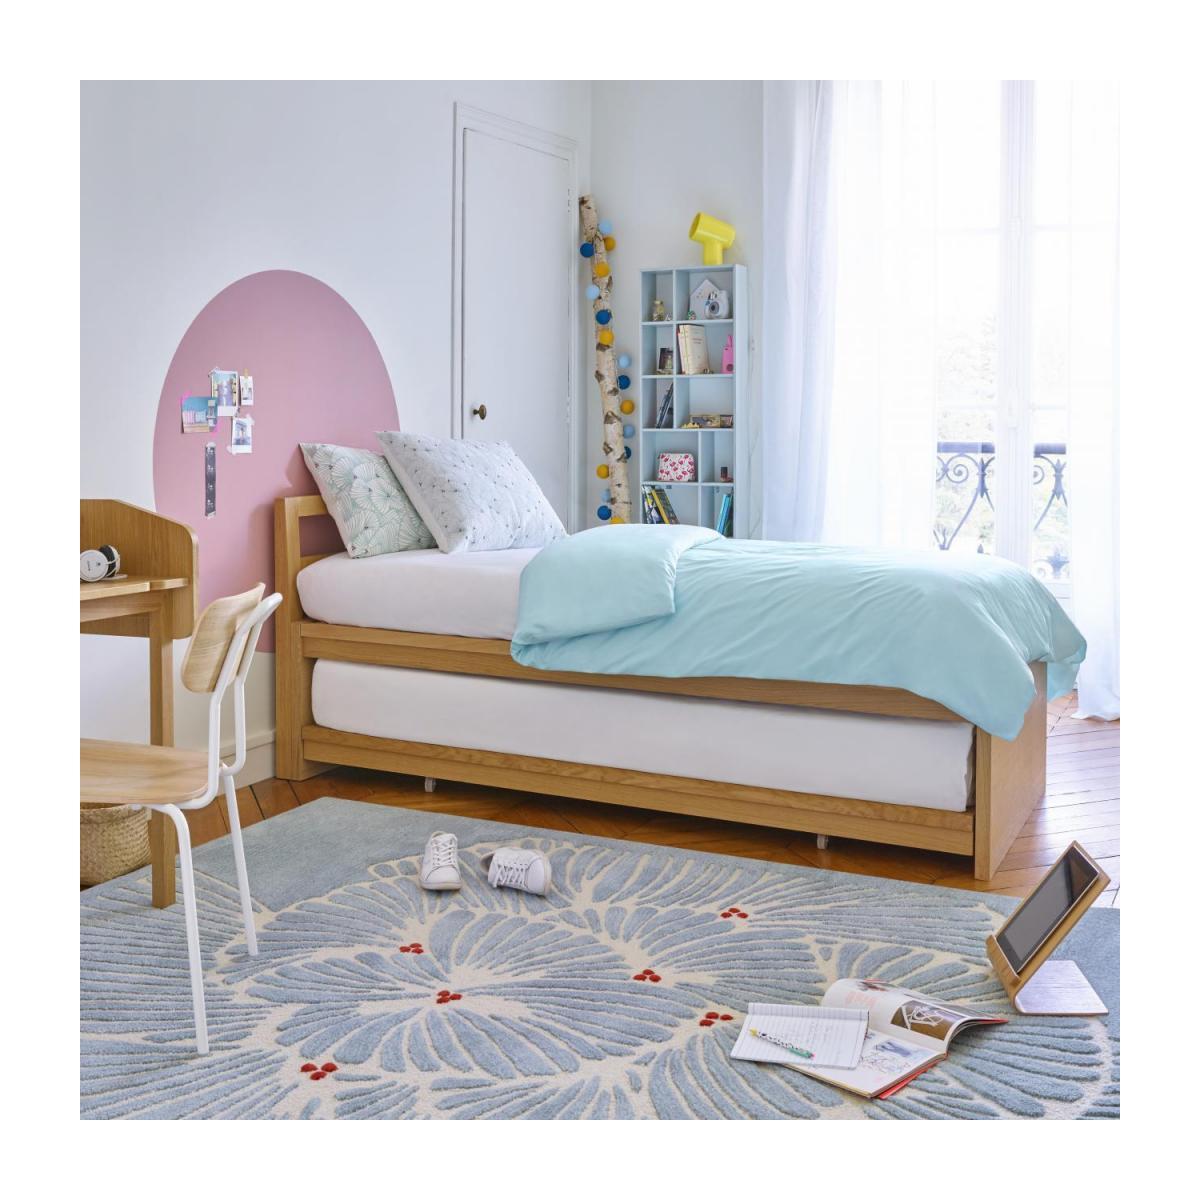 Full Size of Klappbares Doppelbett Bett Bauen Adams Ausziehbares Habitat Ausklappbares Wohnzimmer Klappbares Doppelbett